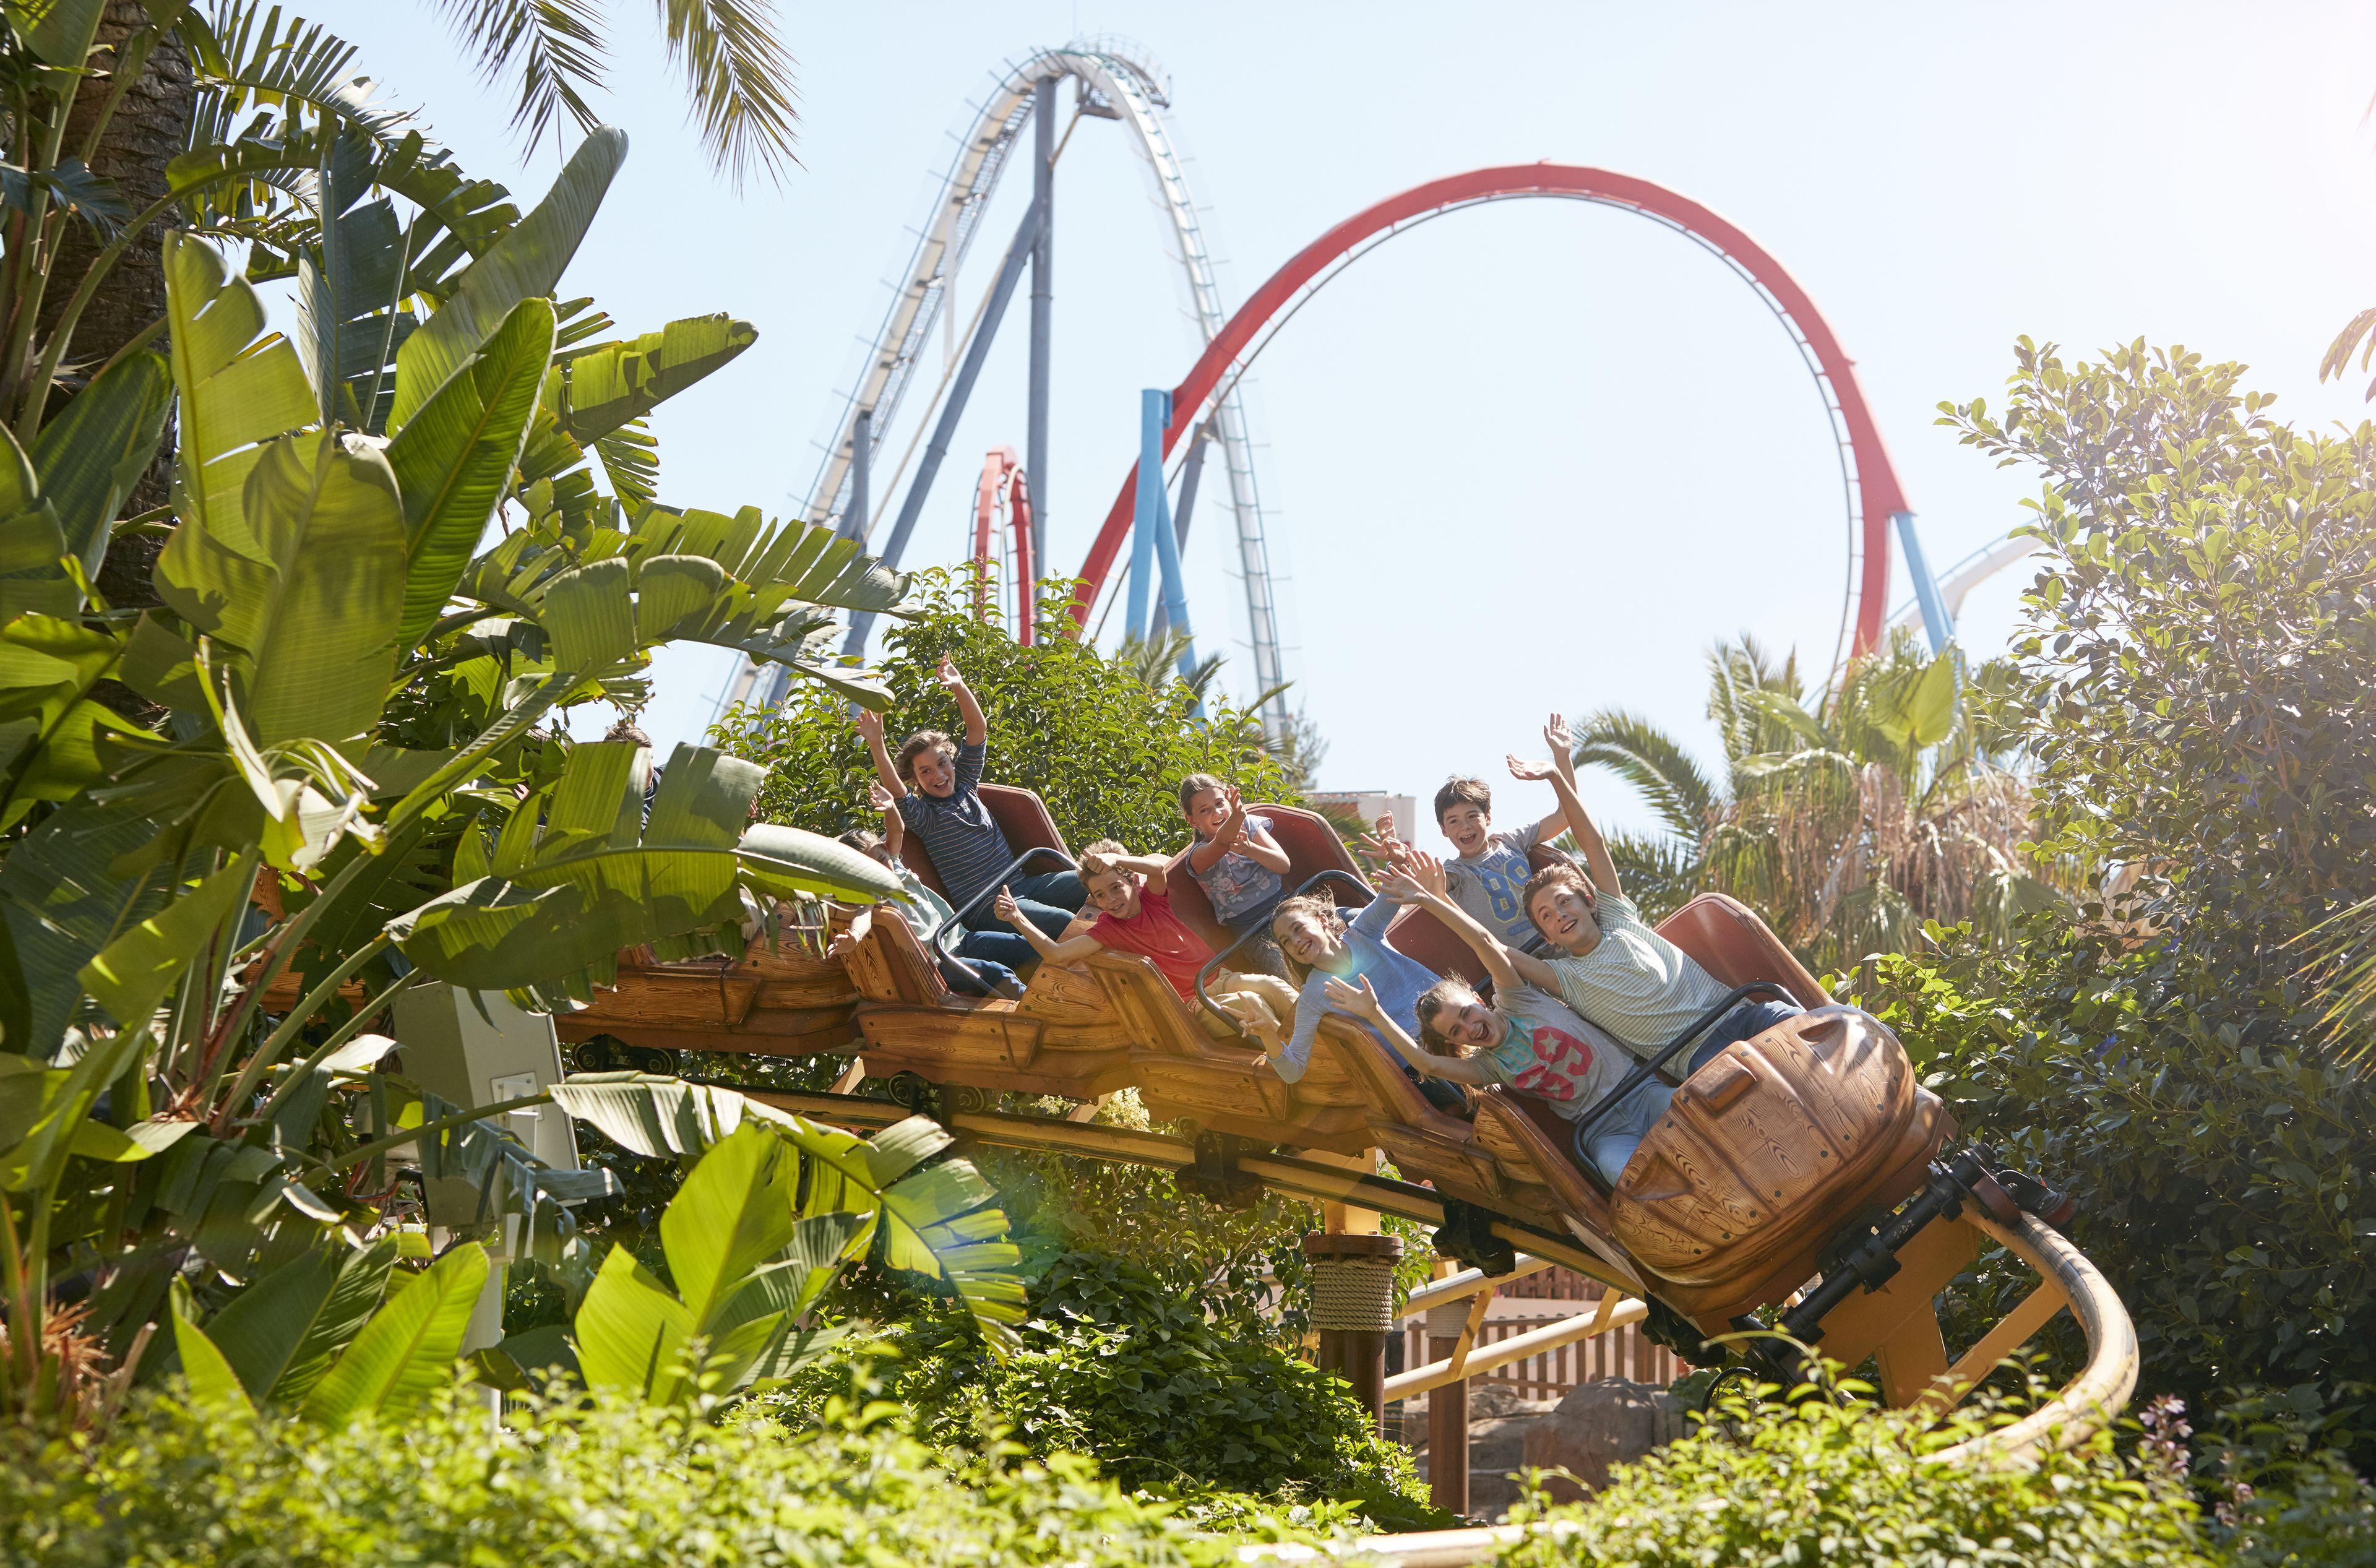 PortAventura Park & Ferrari Land Tickets with Transportation